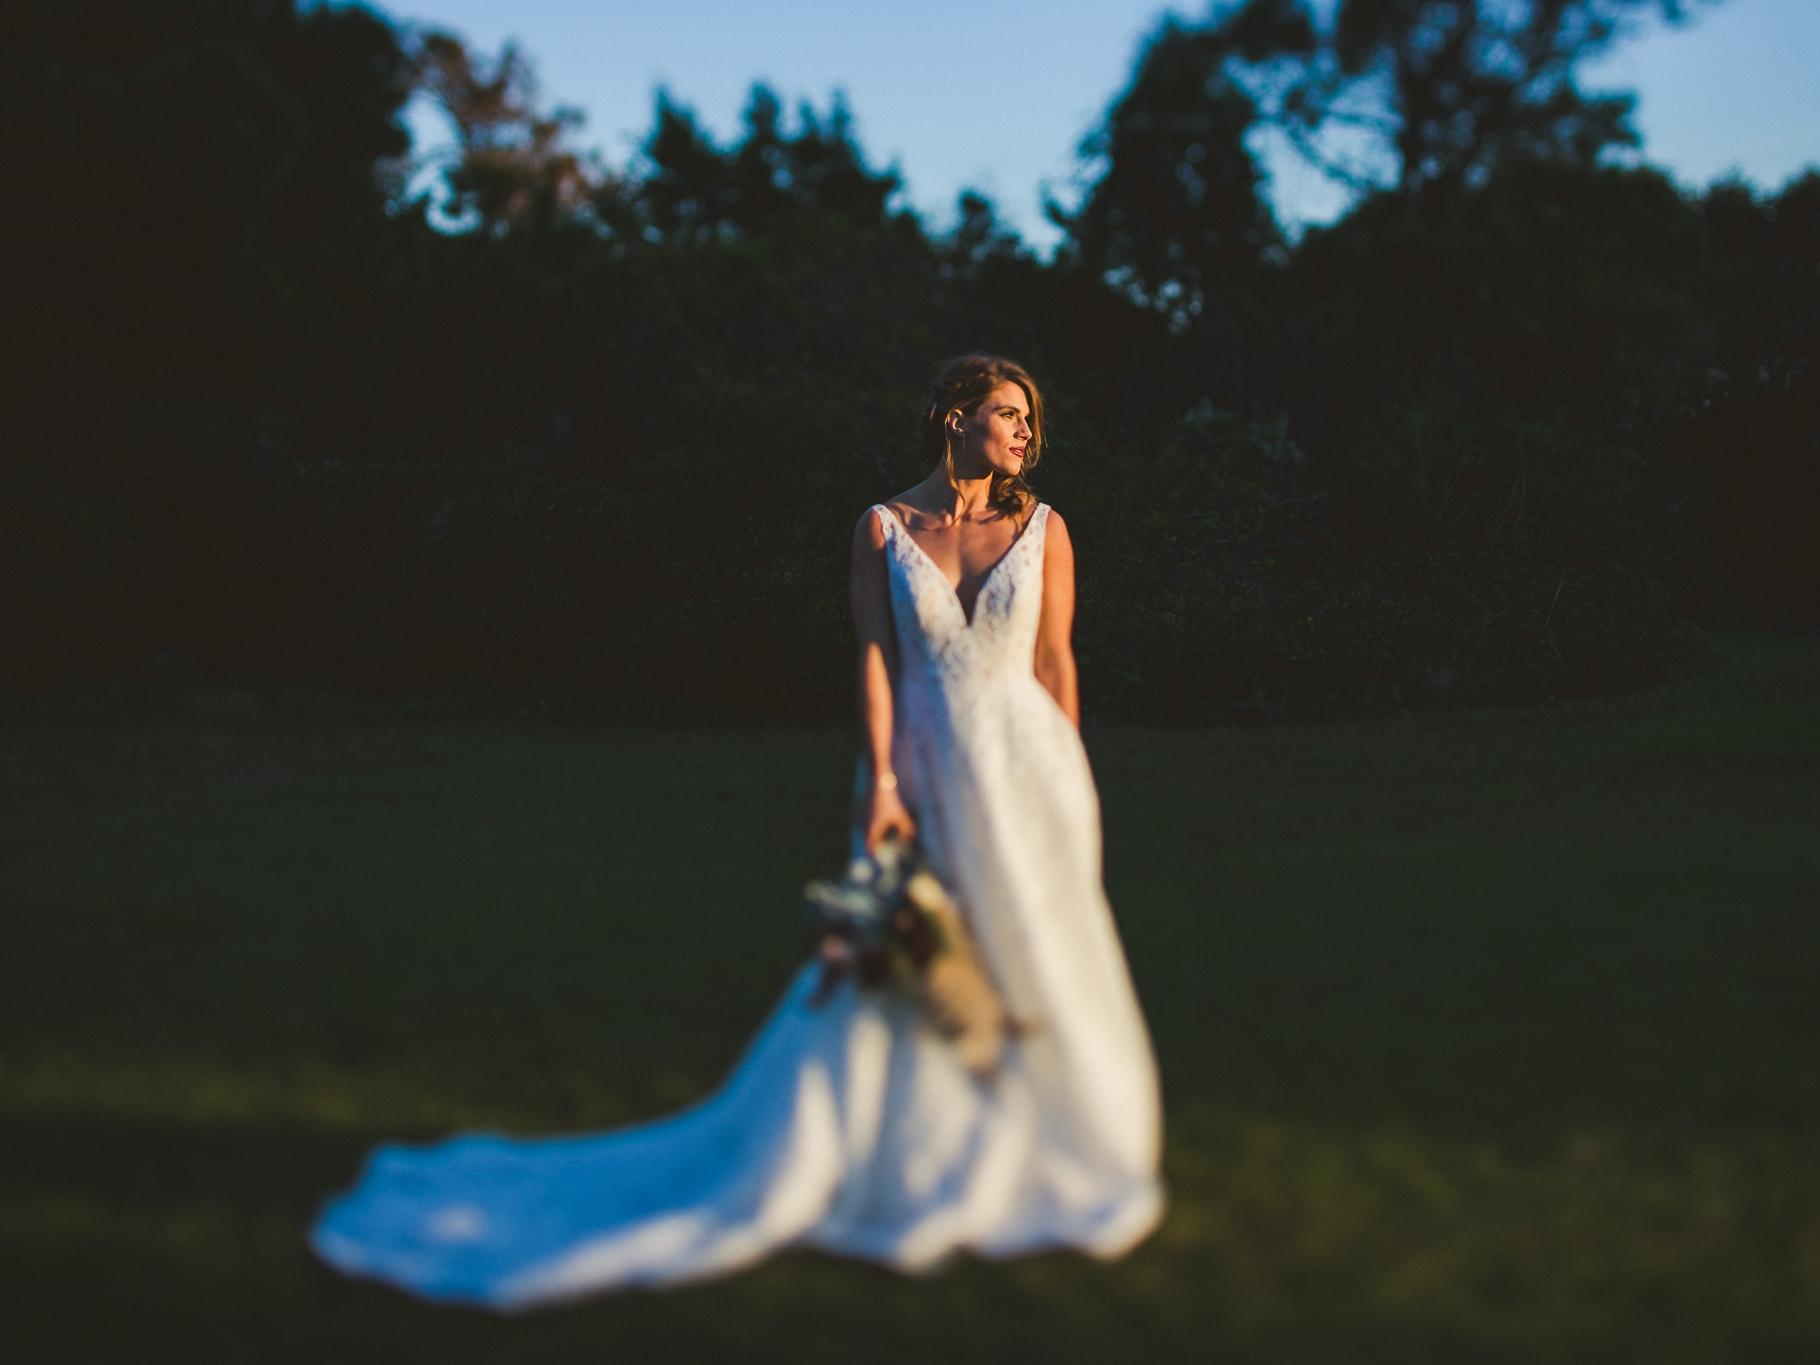 Alle // Bridal Shoot - Atalaya Castle Murrells Inlet, SC